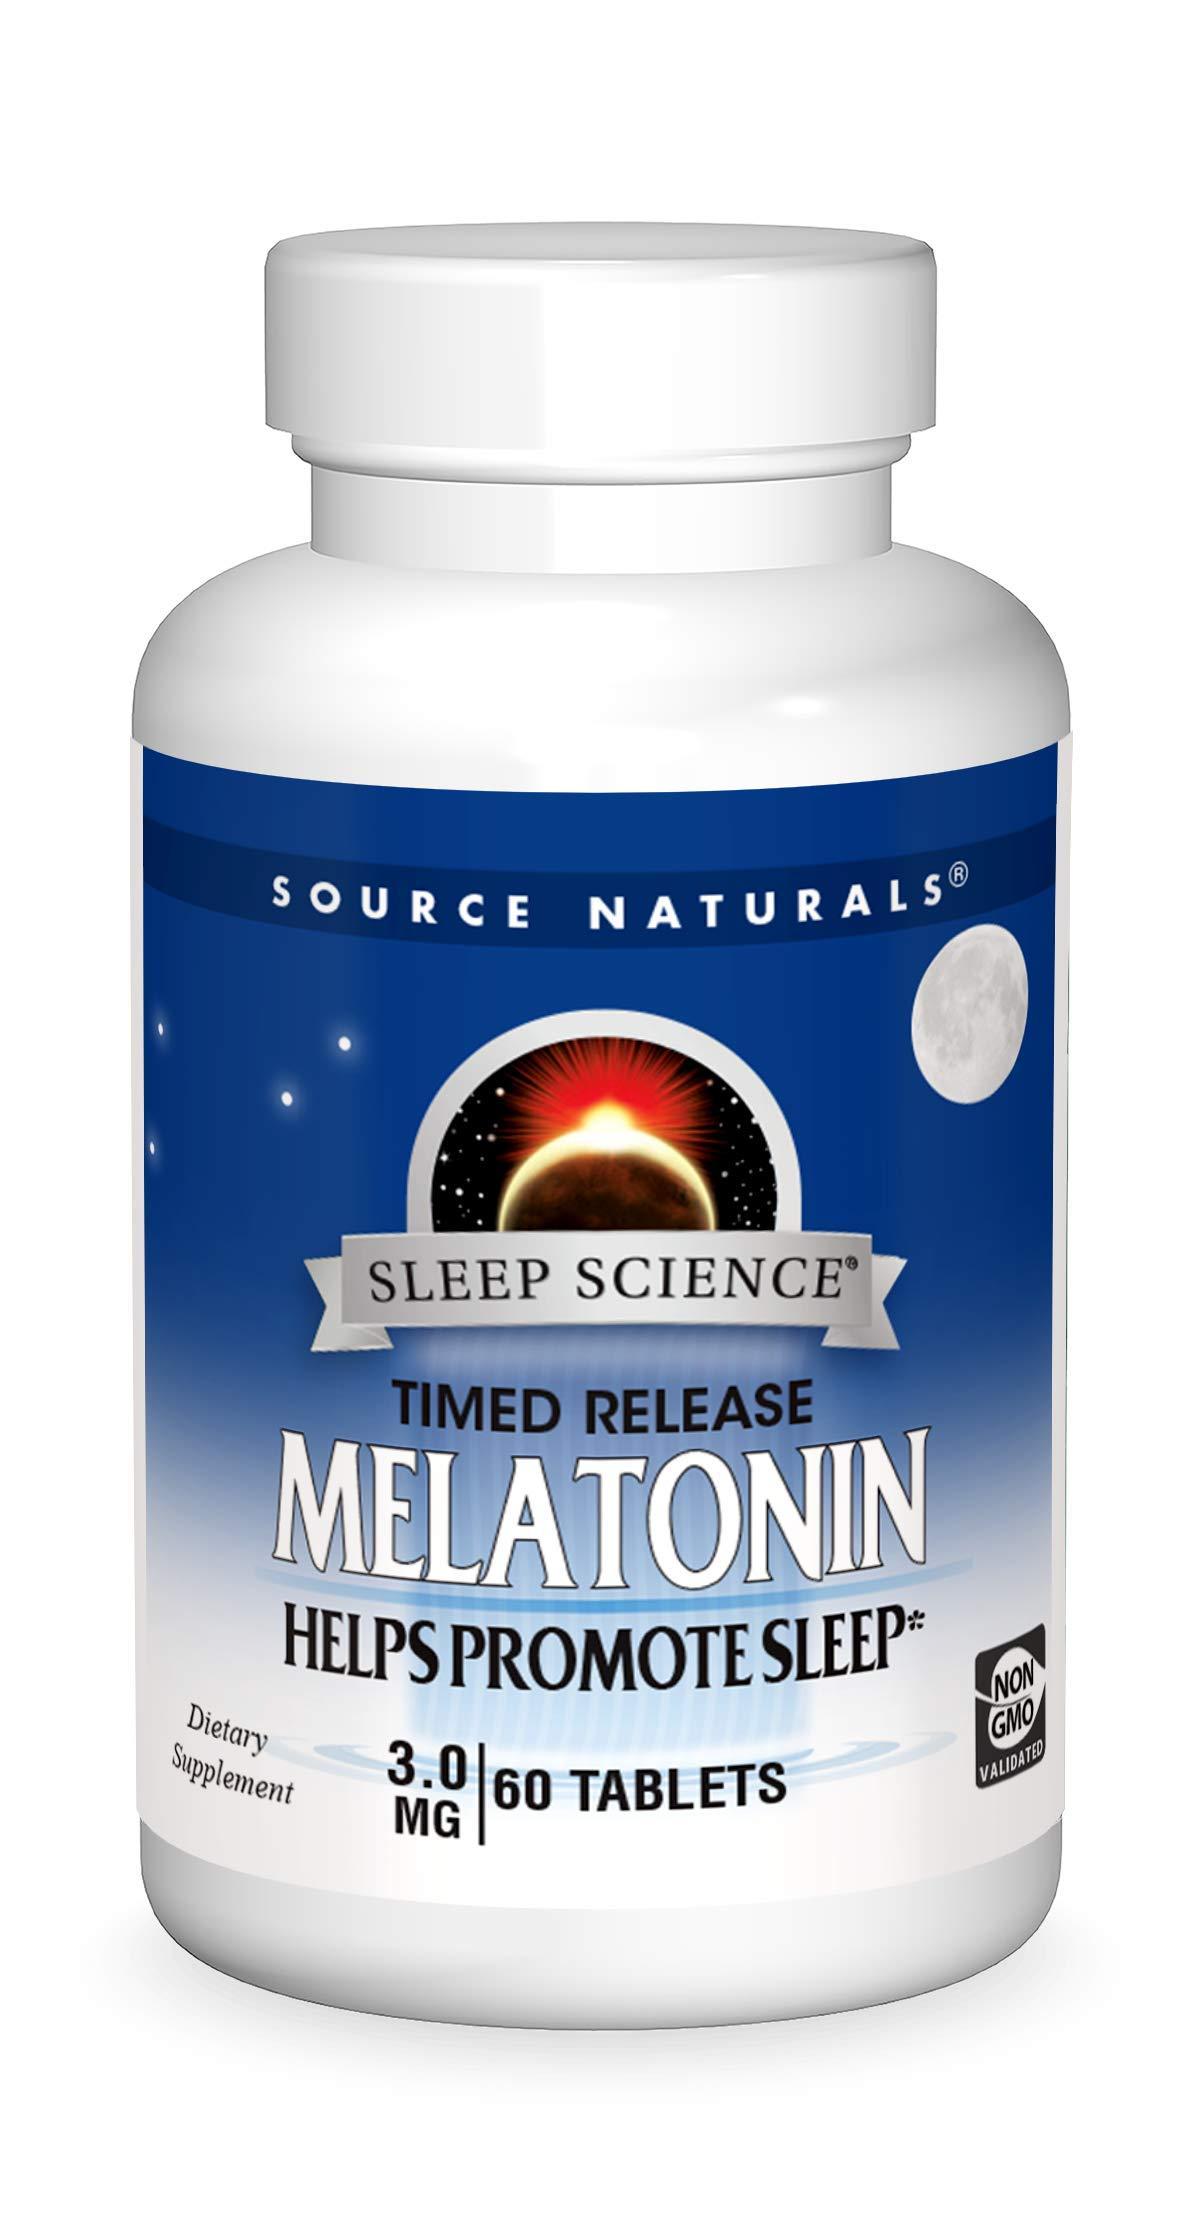 Source Naturals Sleep Science Melatonin 3 mg Helps Promote Sleep - 120 Time Release Tablets